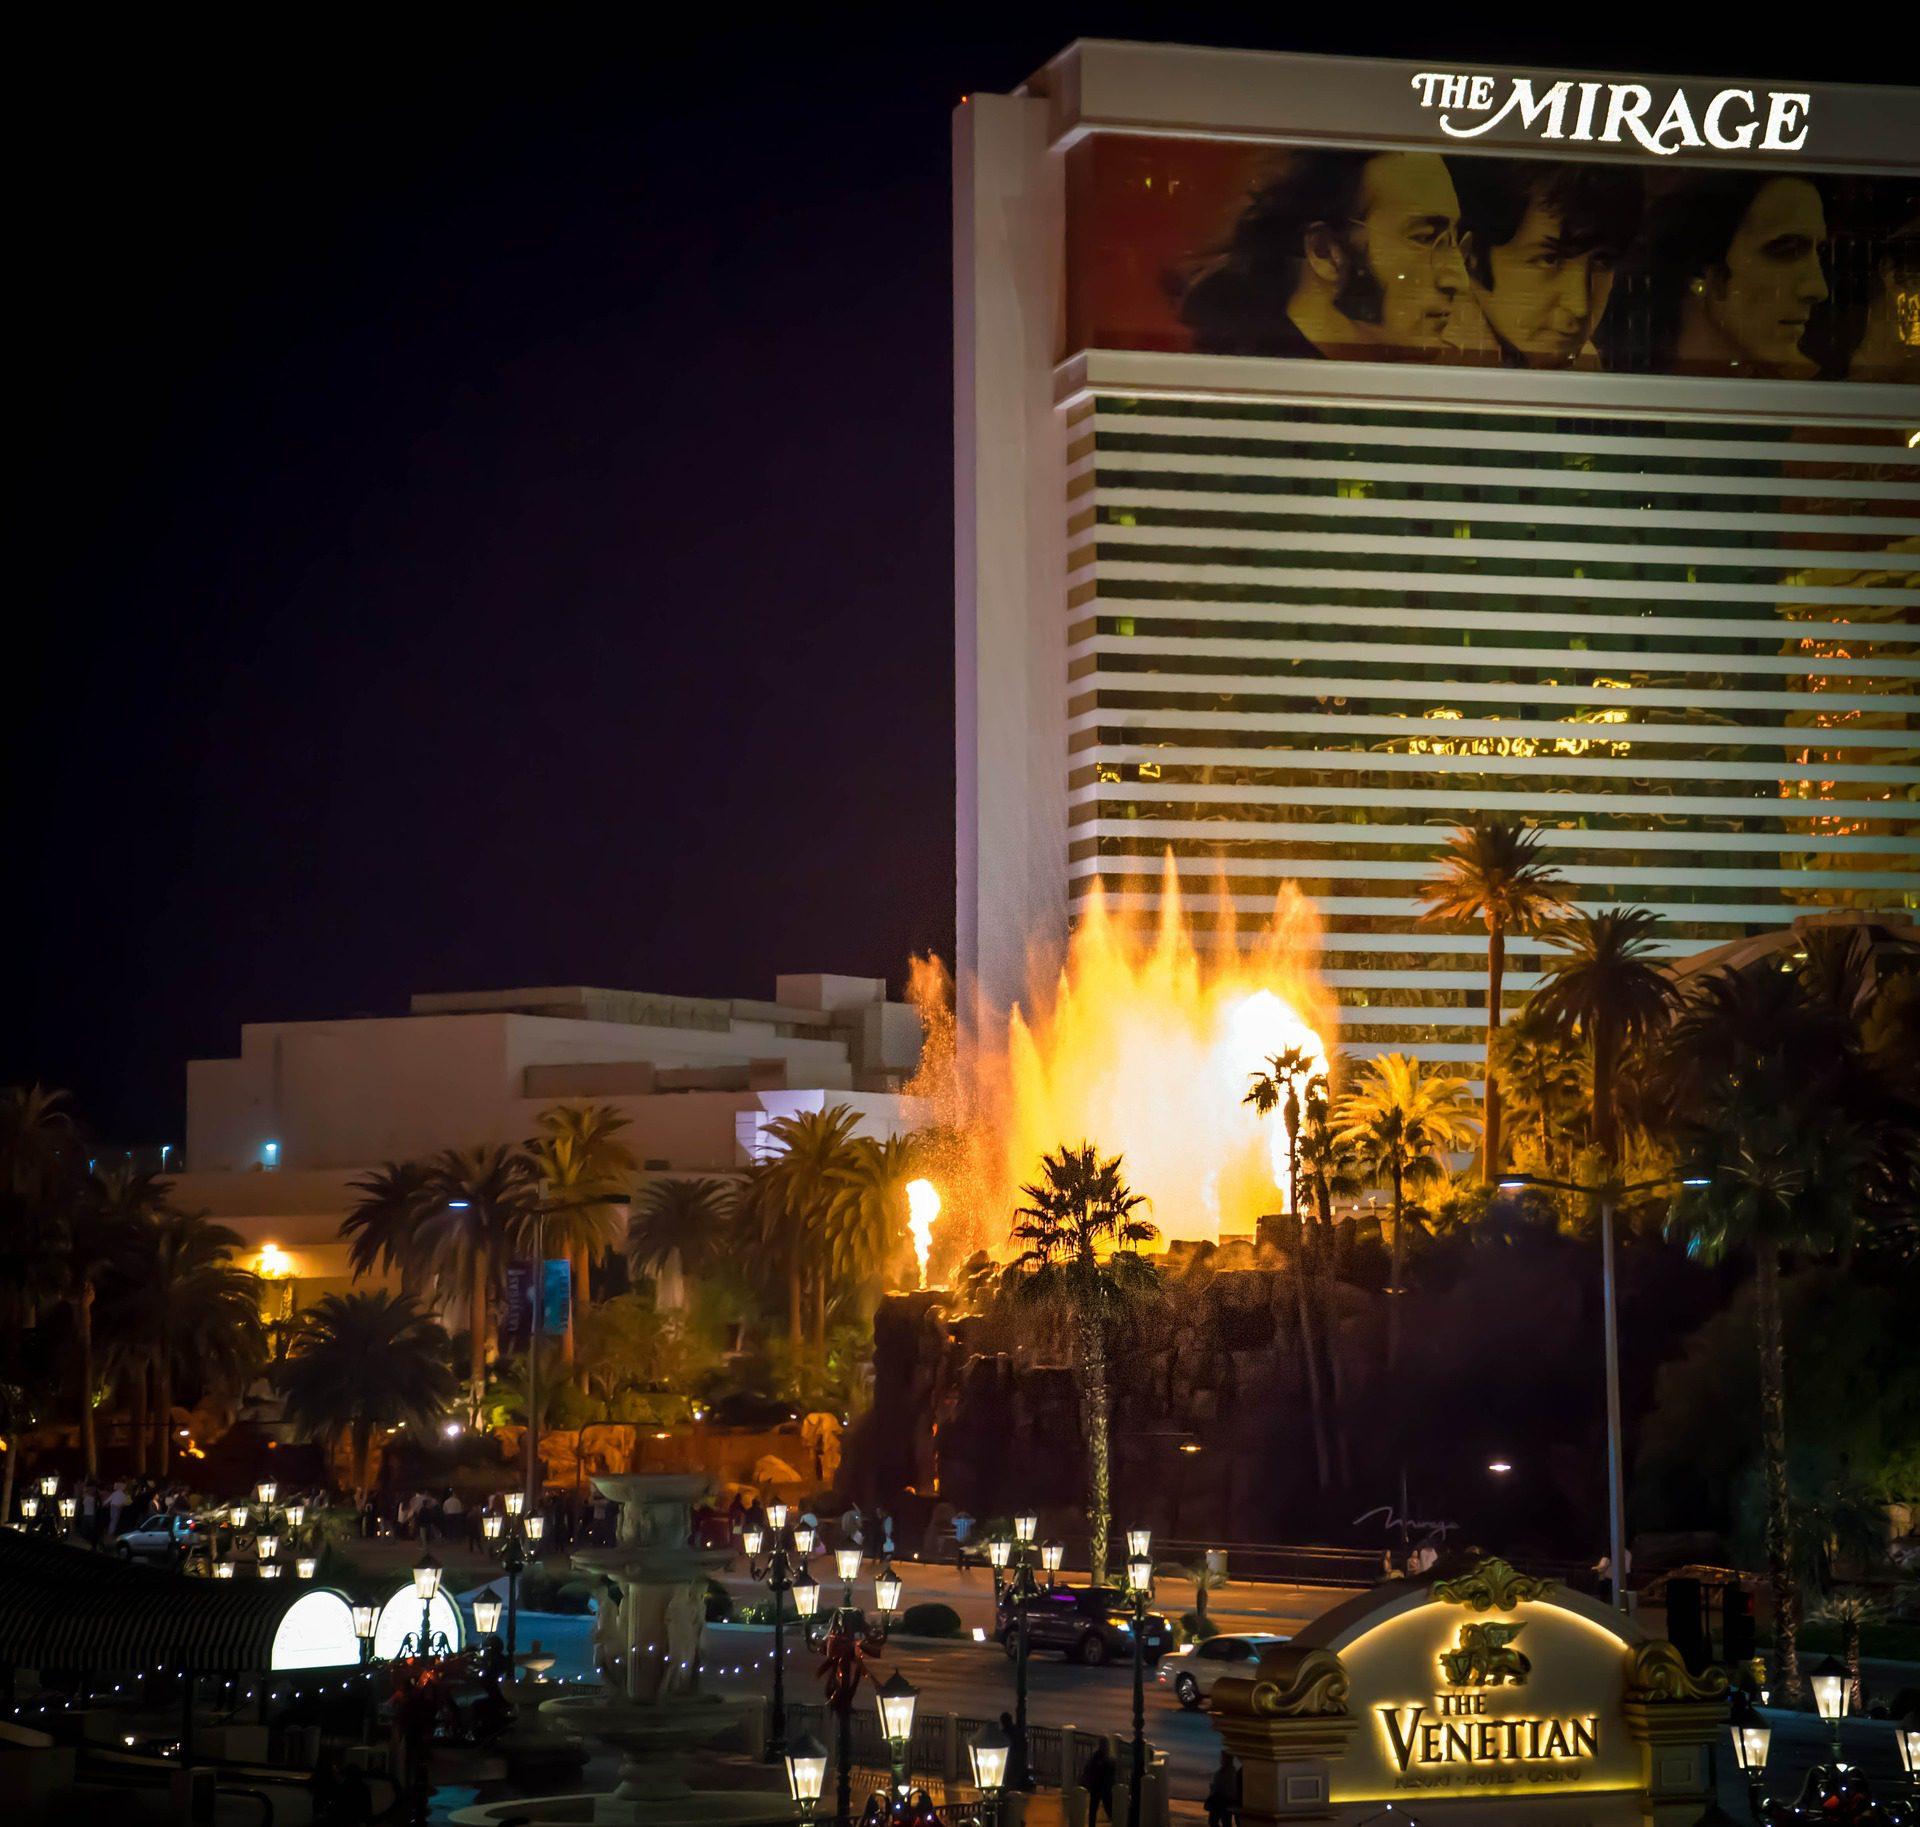 Volcano at The Mirage, Las Vegas